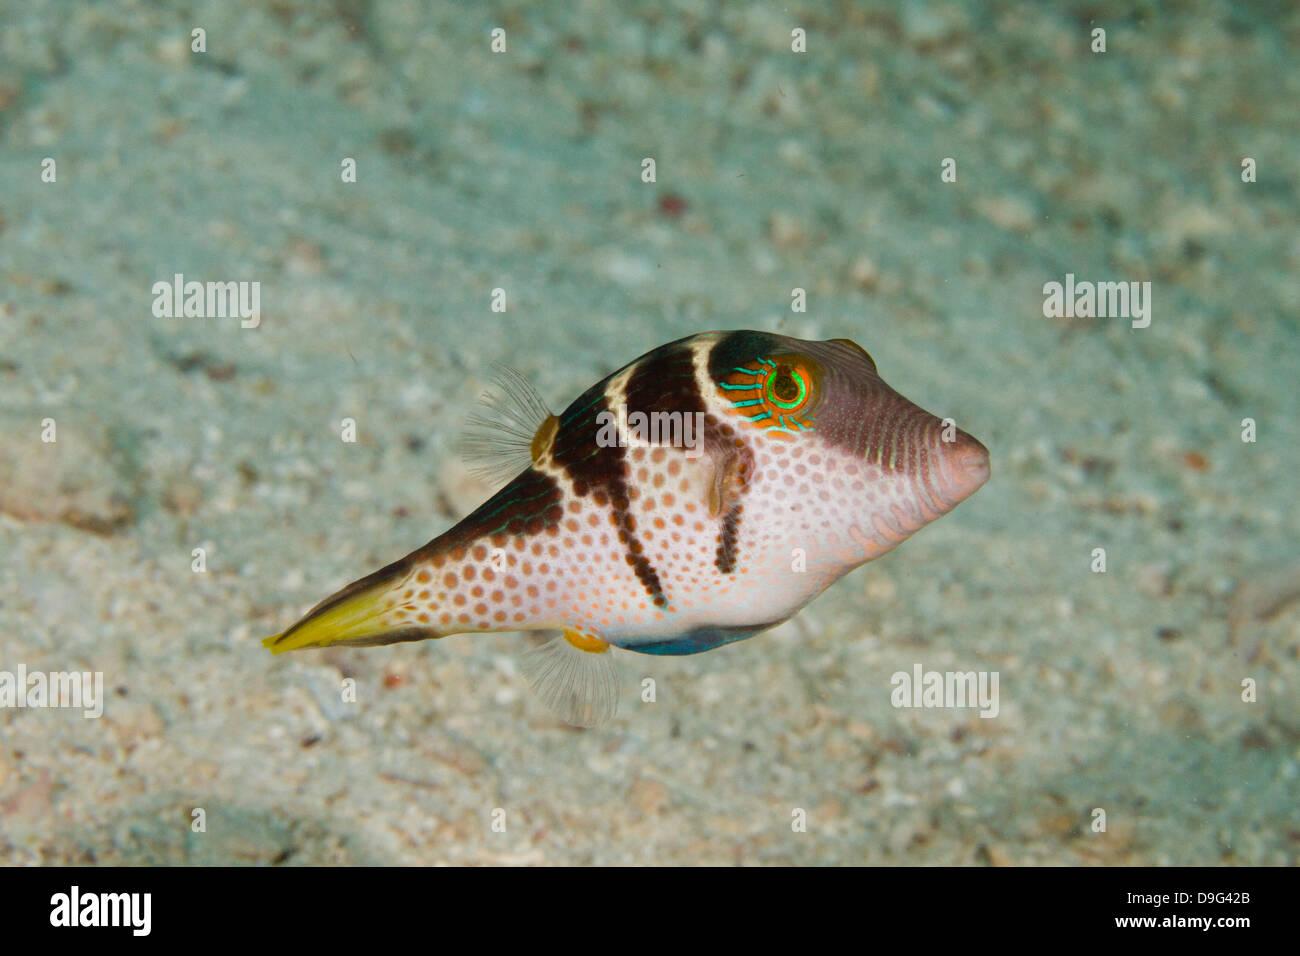 Black saddled puffer fish, Canthigaster valentini, Mabul, Borneo, Malaysia Stock Photo